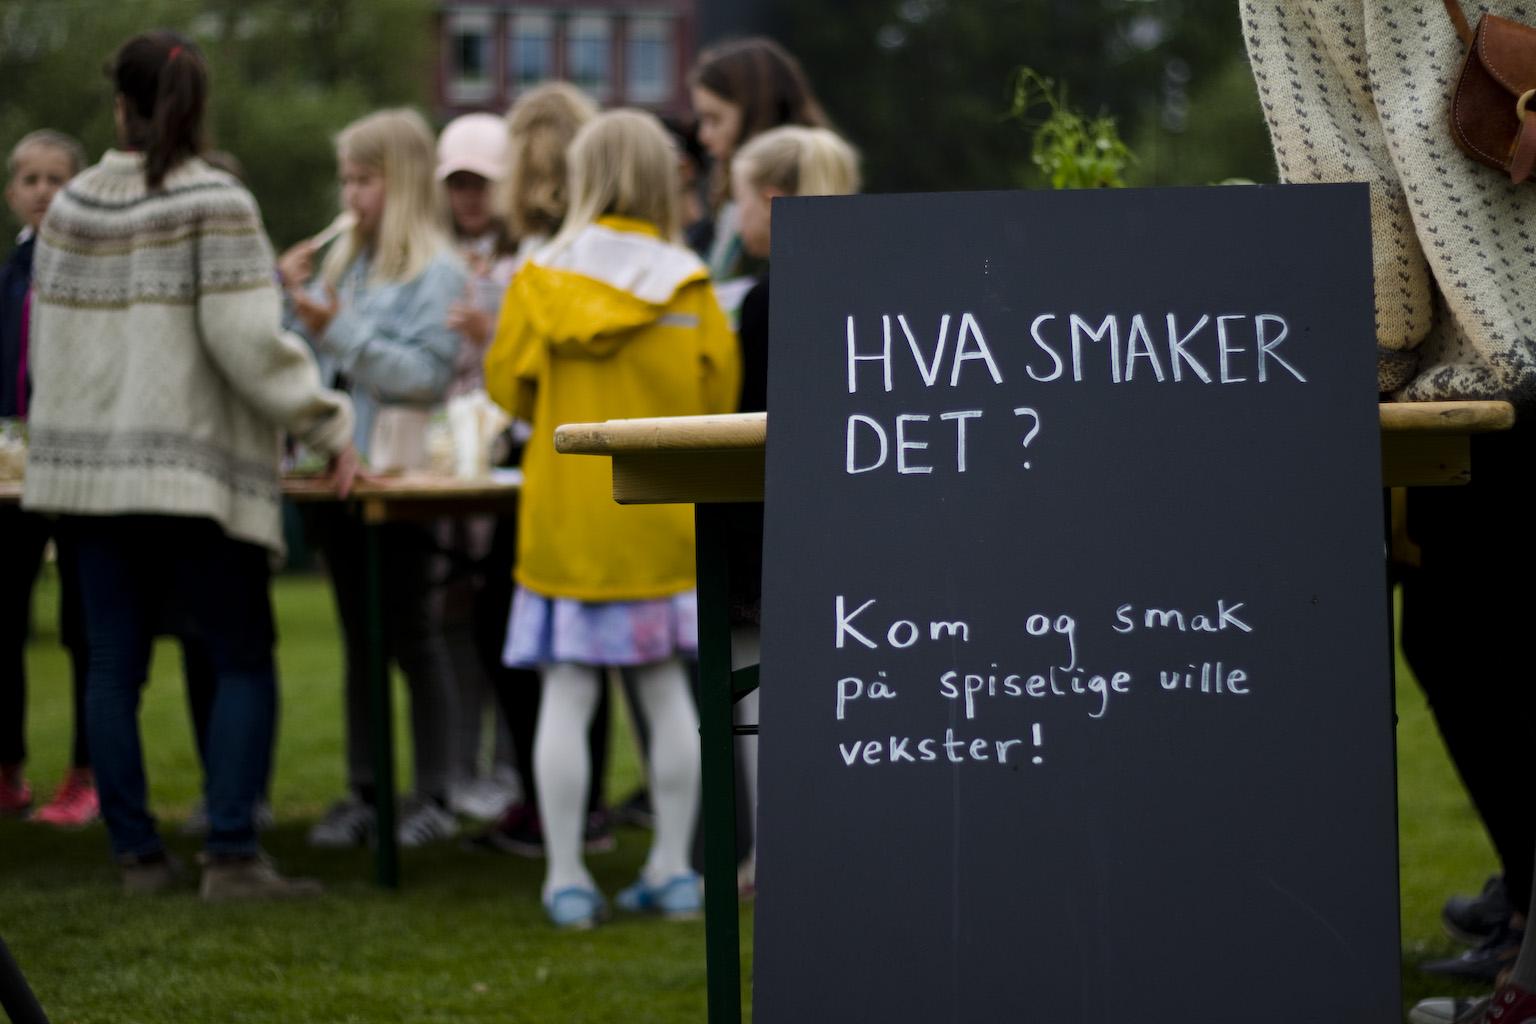 Photo: Anja Bergersen